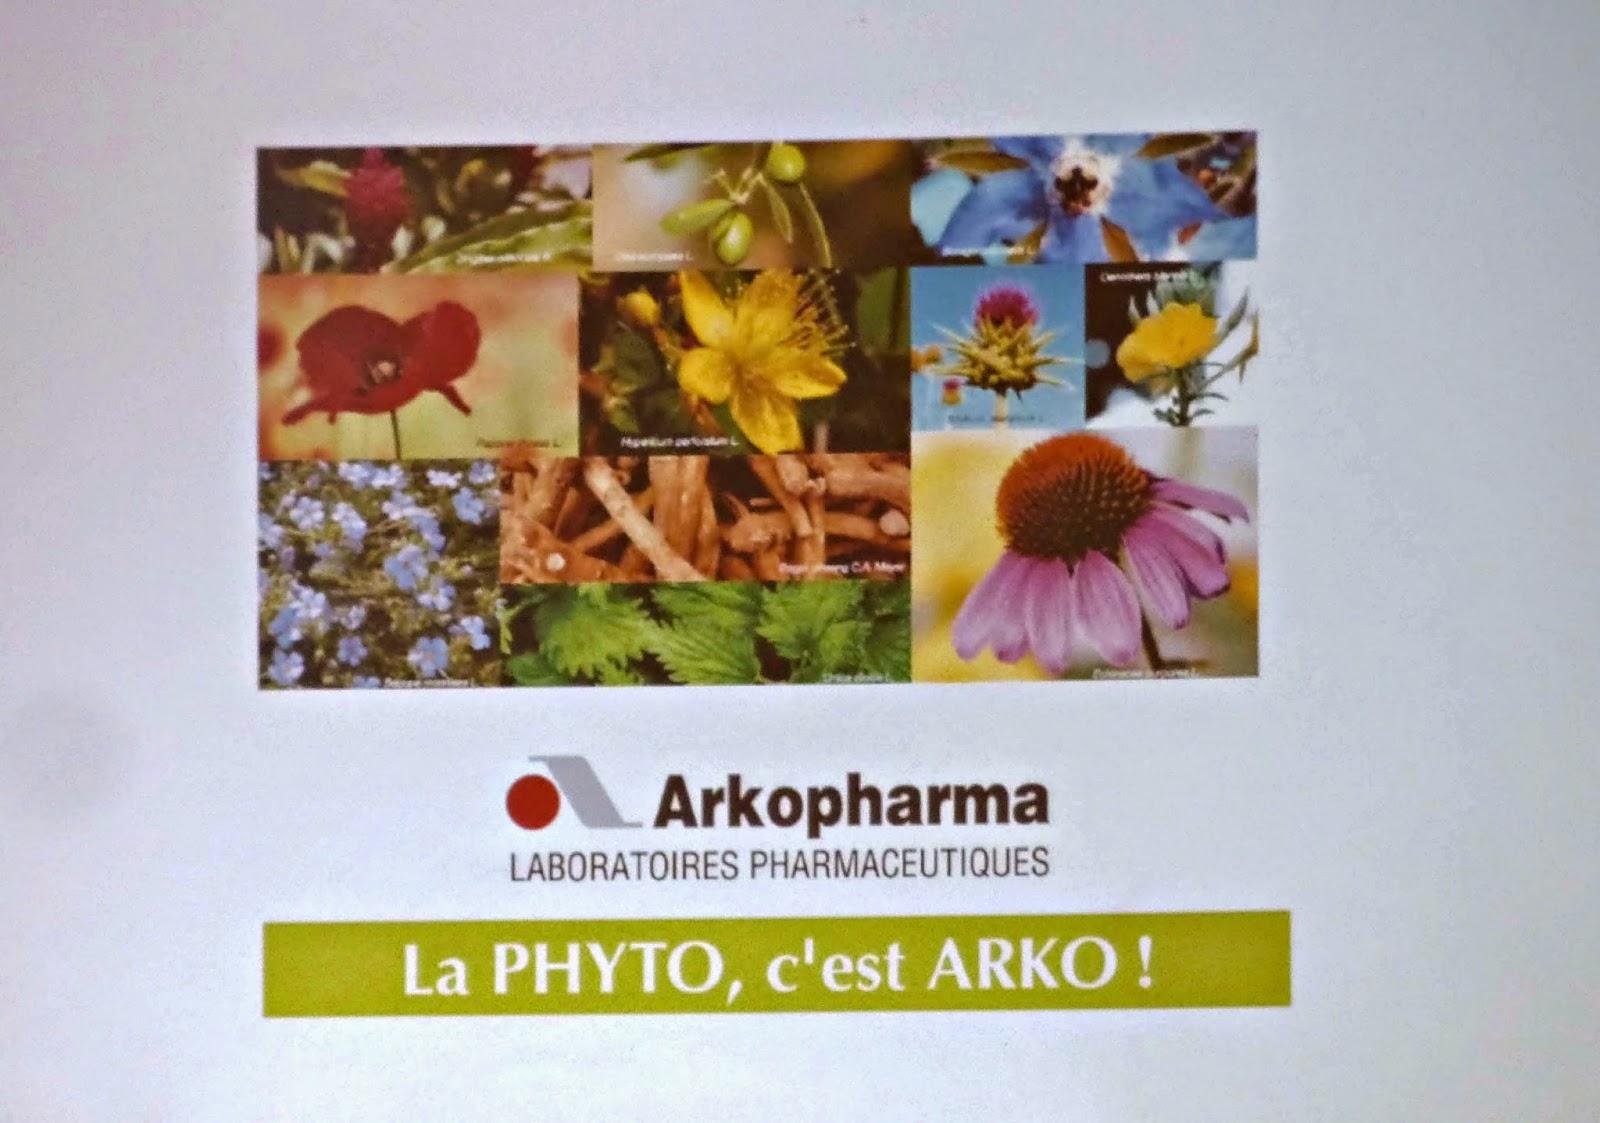 arkopharma, phytothérapie, médecine naturelle